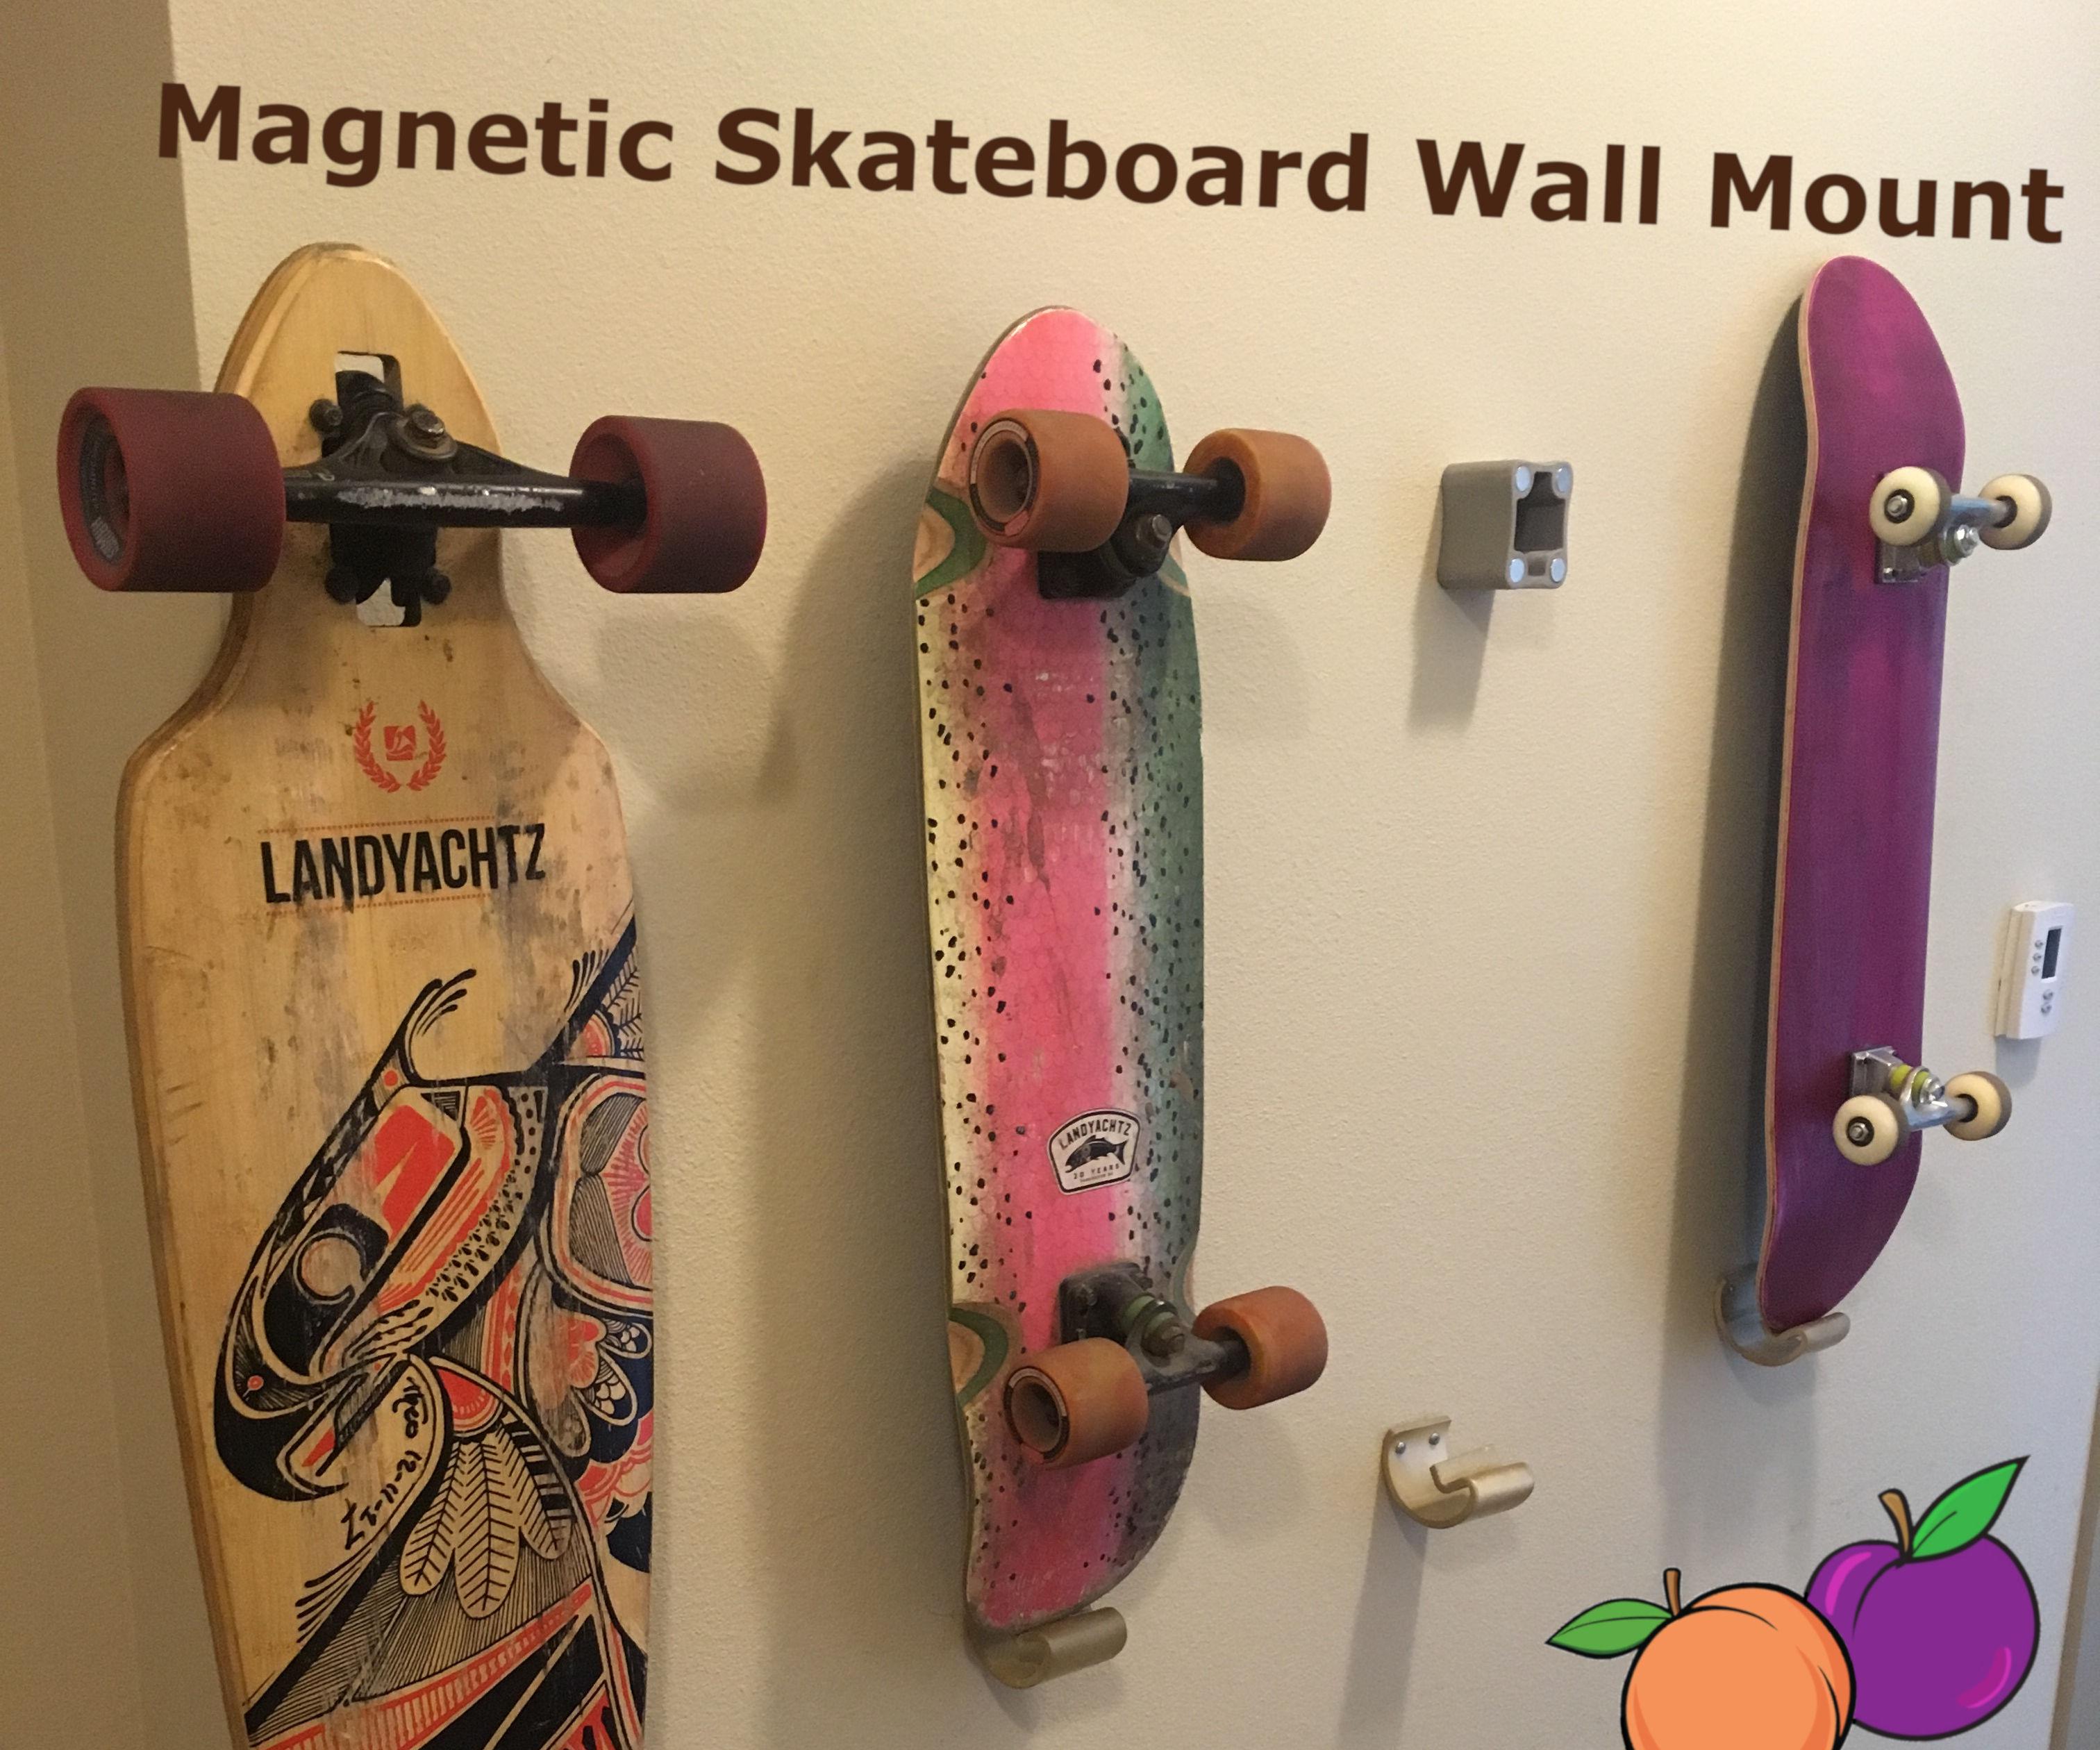 Invisible(ish) Skateboard Holder